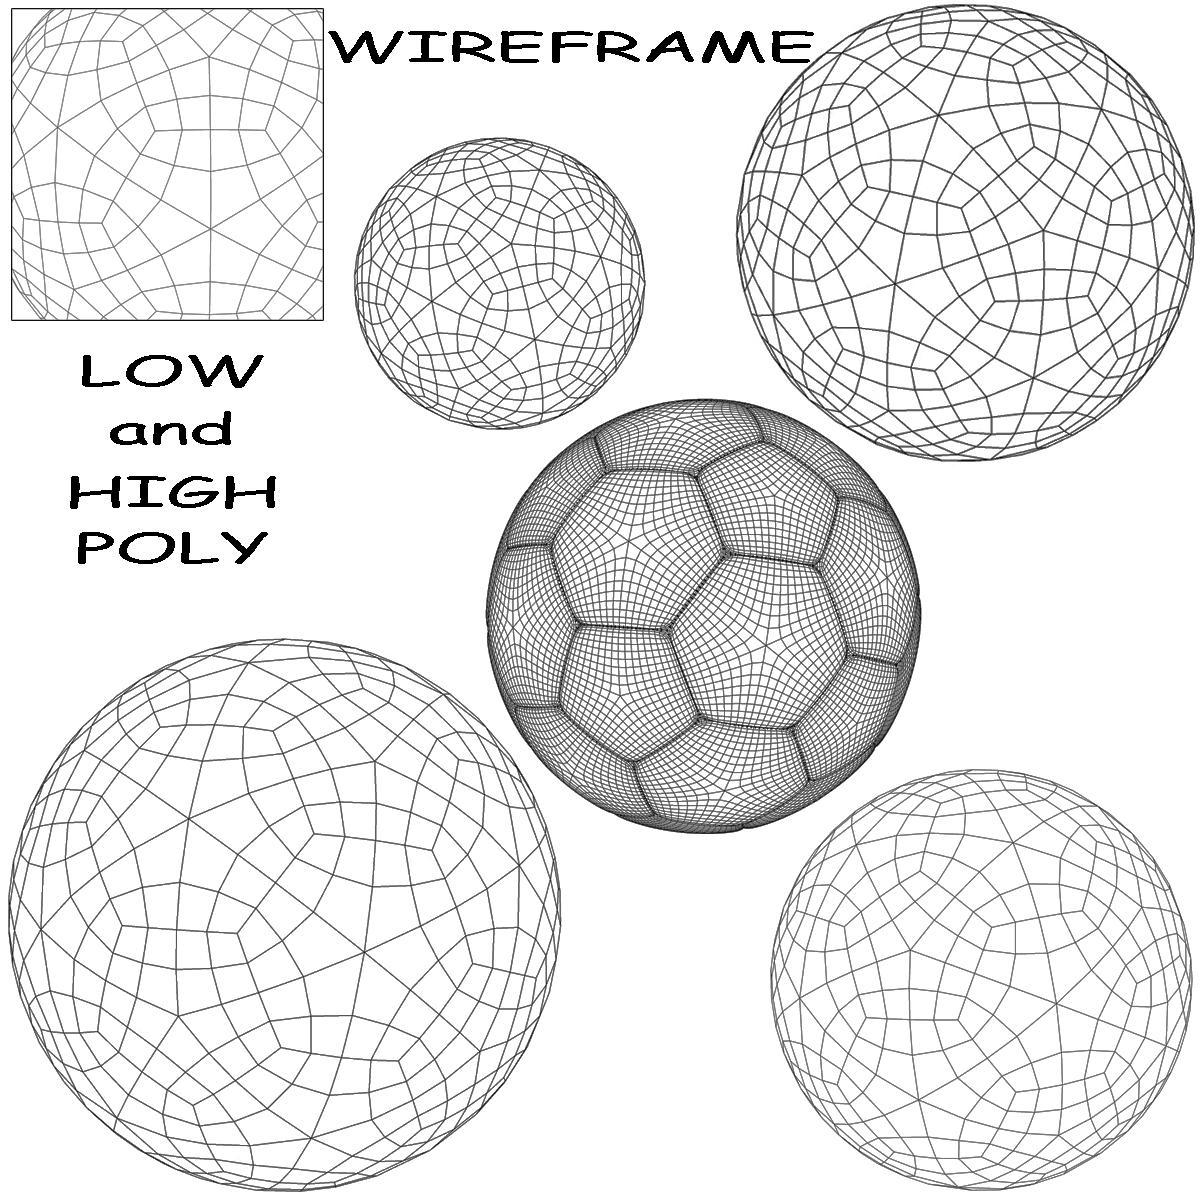 soccerball хар цагаан tri 3d загвар 3ds max fbx c4d ma mb obj 204051